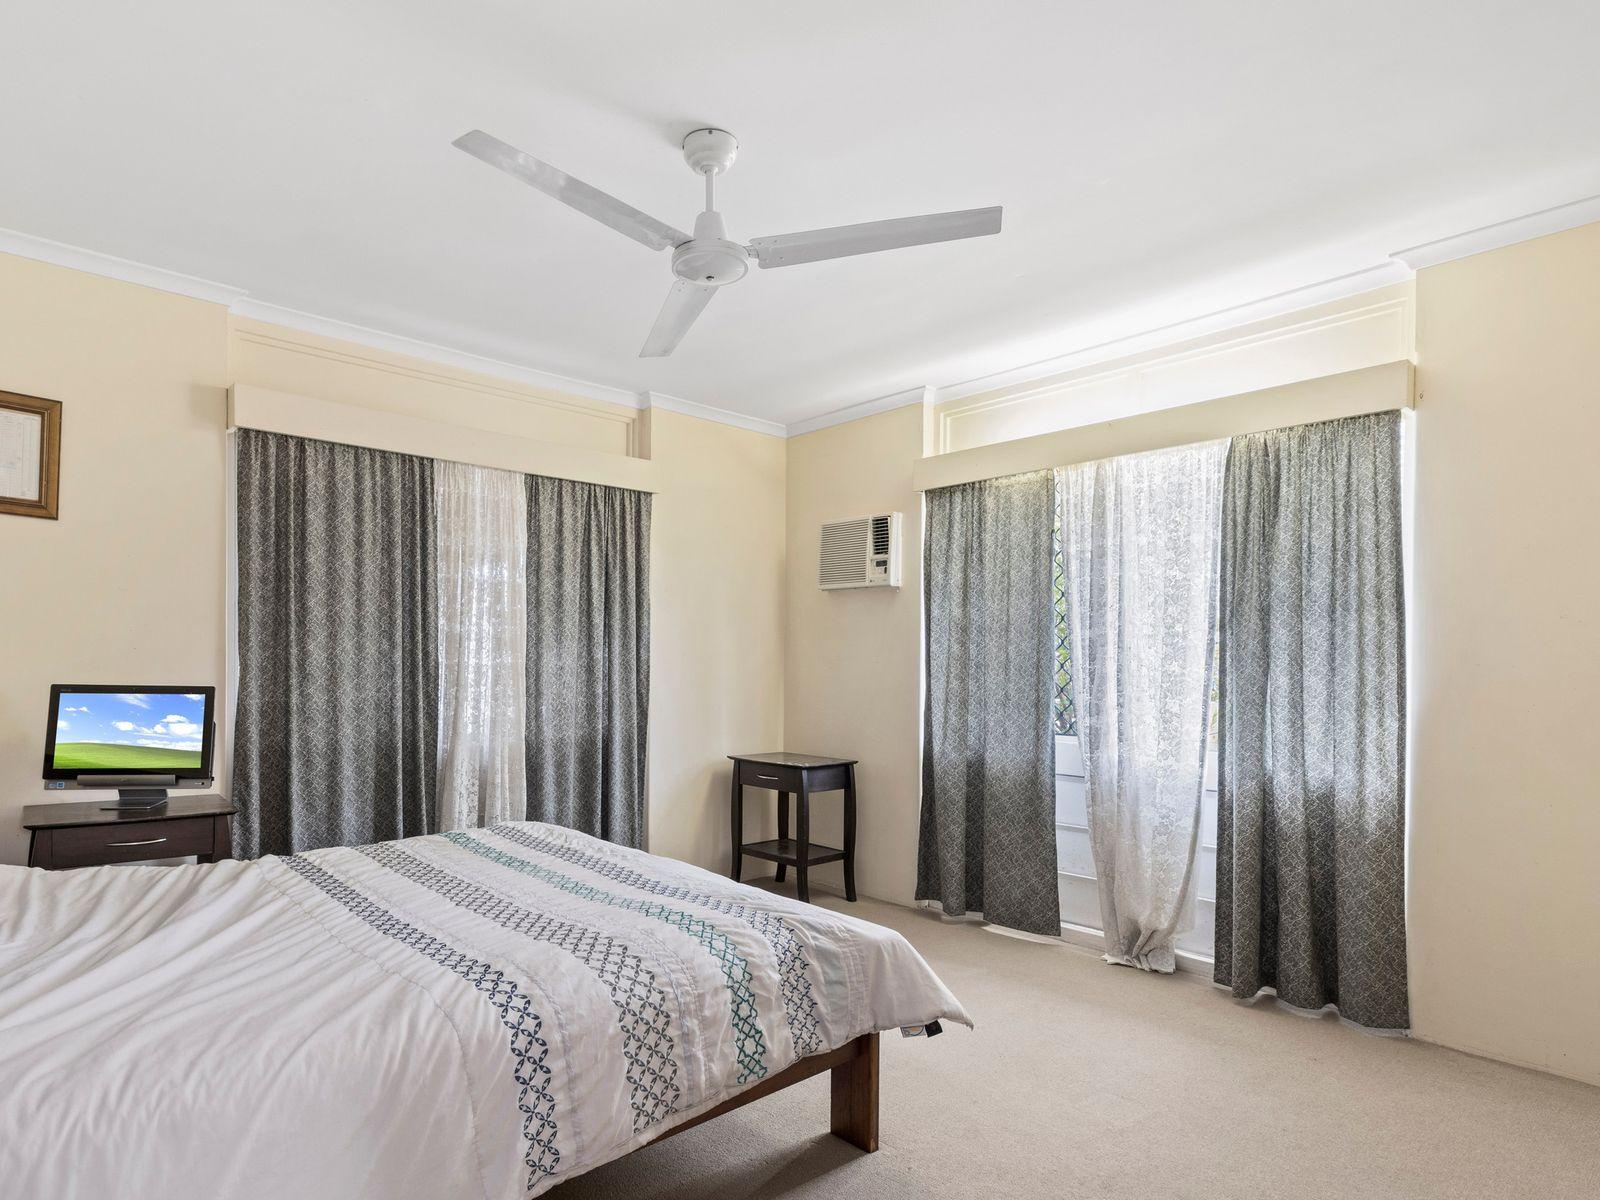 161-163 McManus Street, Whitfield, QLD 4870